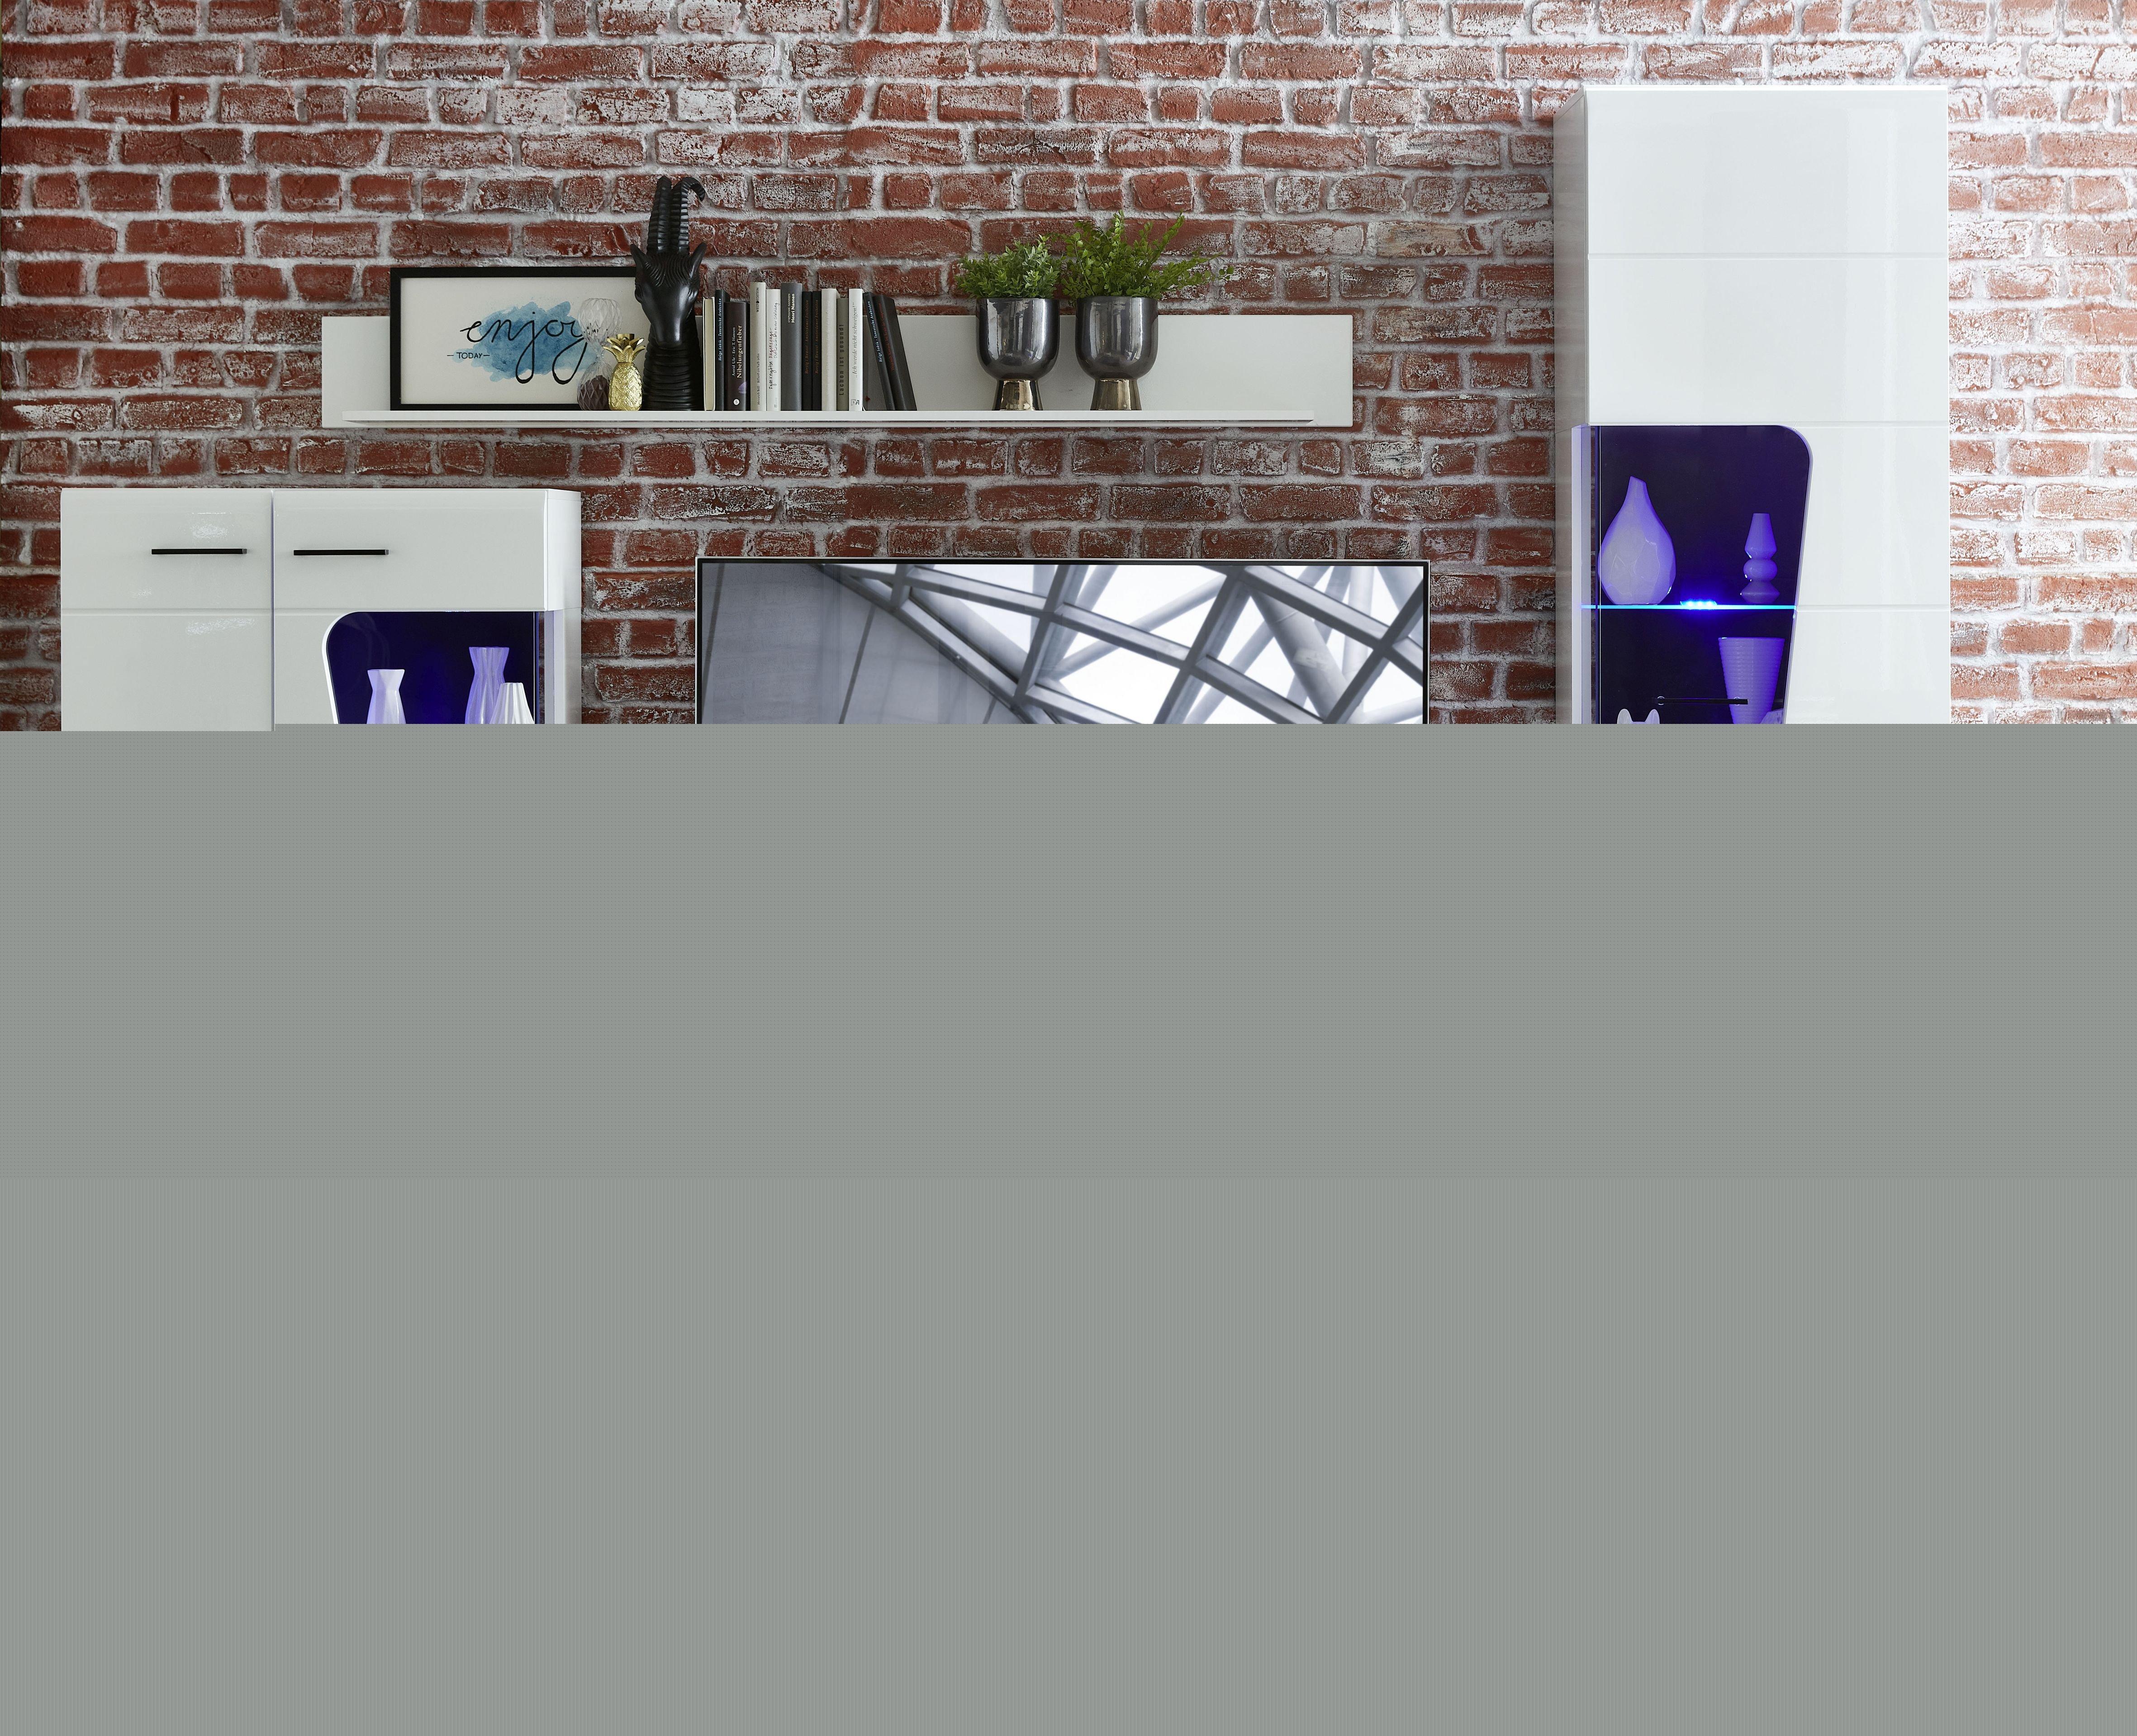 FUNNY PLUS TV-/Wohnlös.+B weiß/weiß HG MDF/Schwarz B/H/T ca. 322/205/47 cm